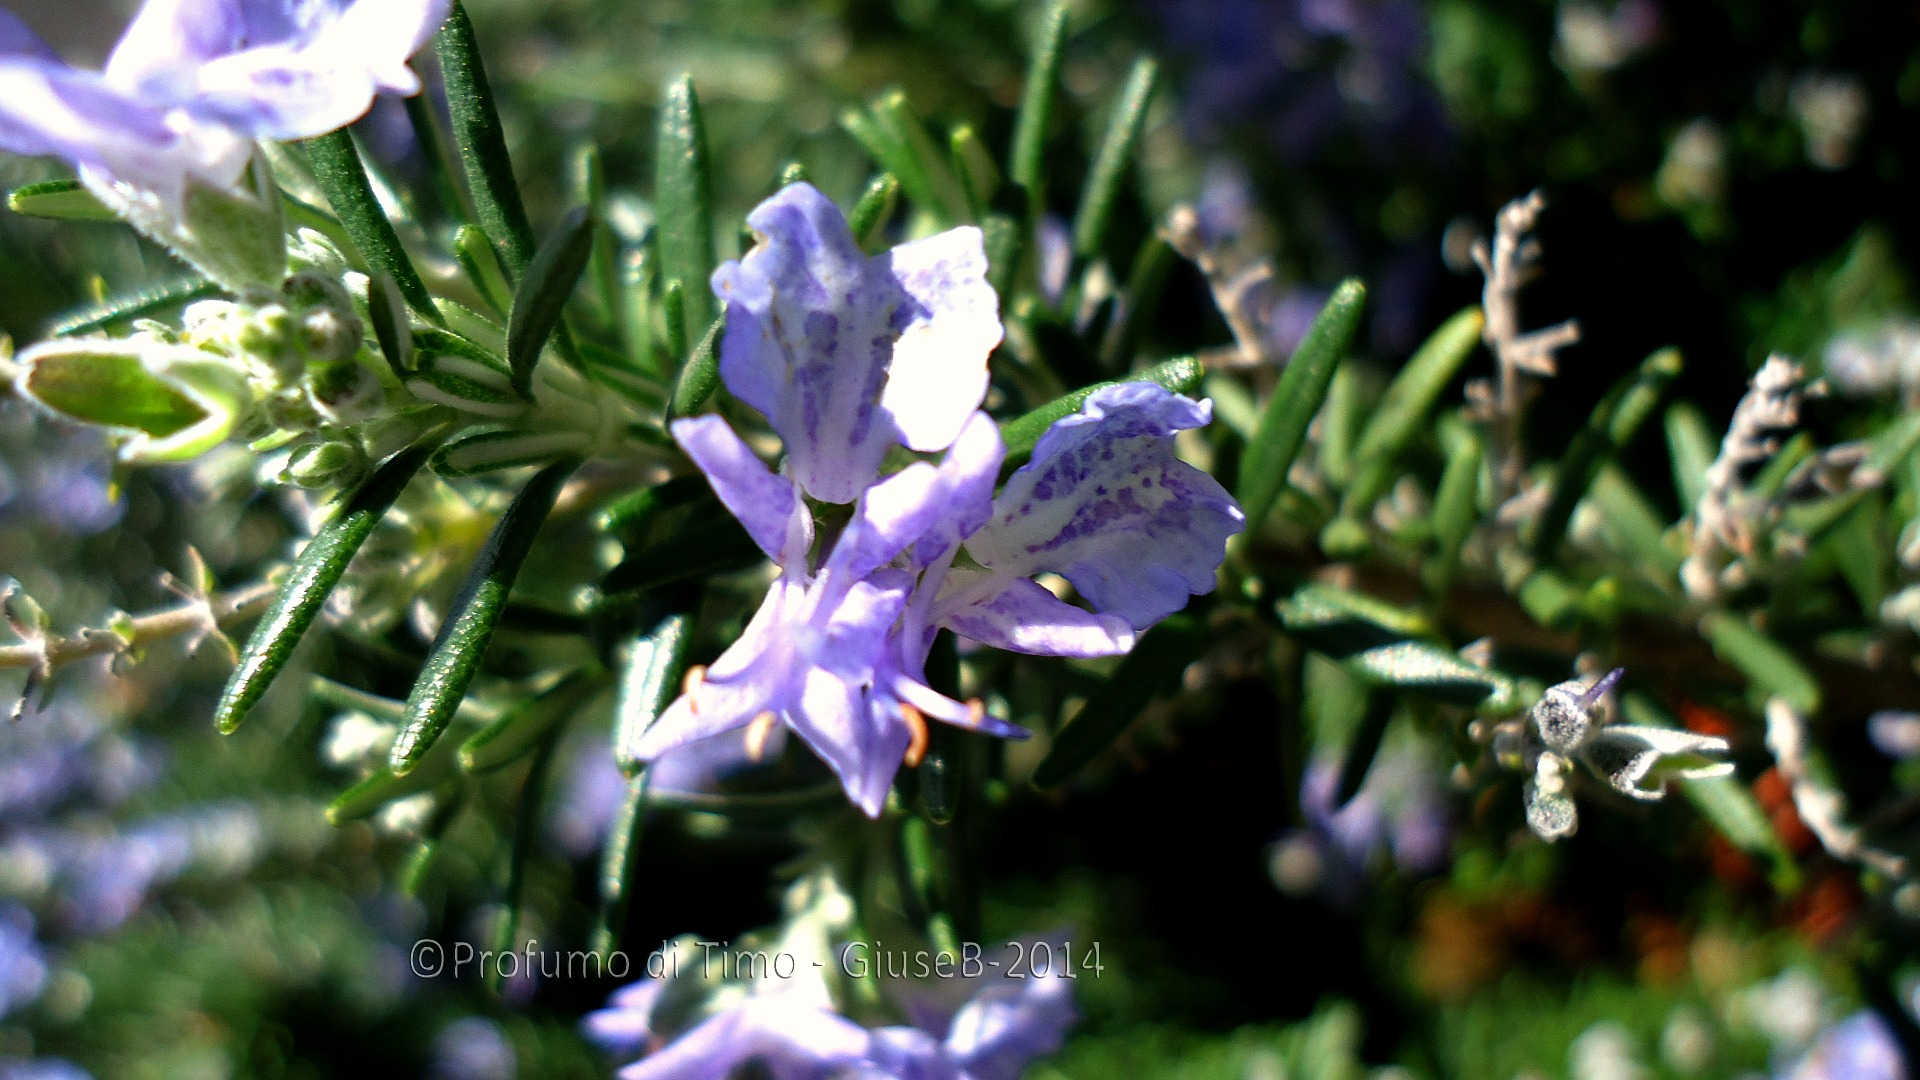 rosmarino in fiore (4)